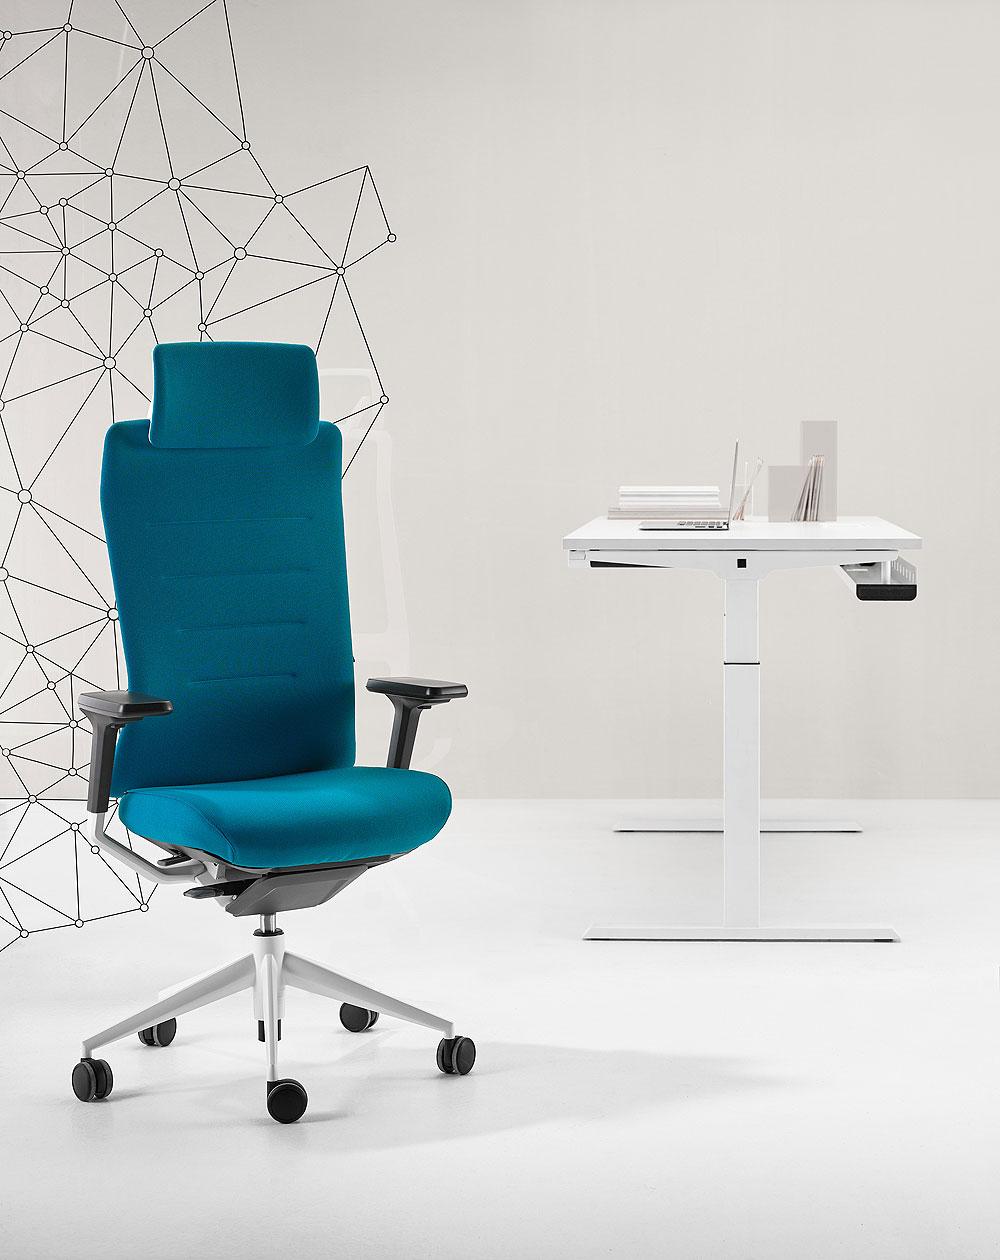 silla-tnk-flex-alegre-design-actiu-cool-working (3)